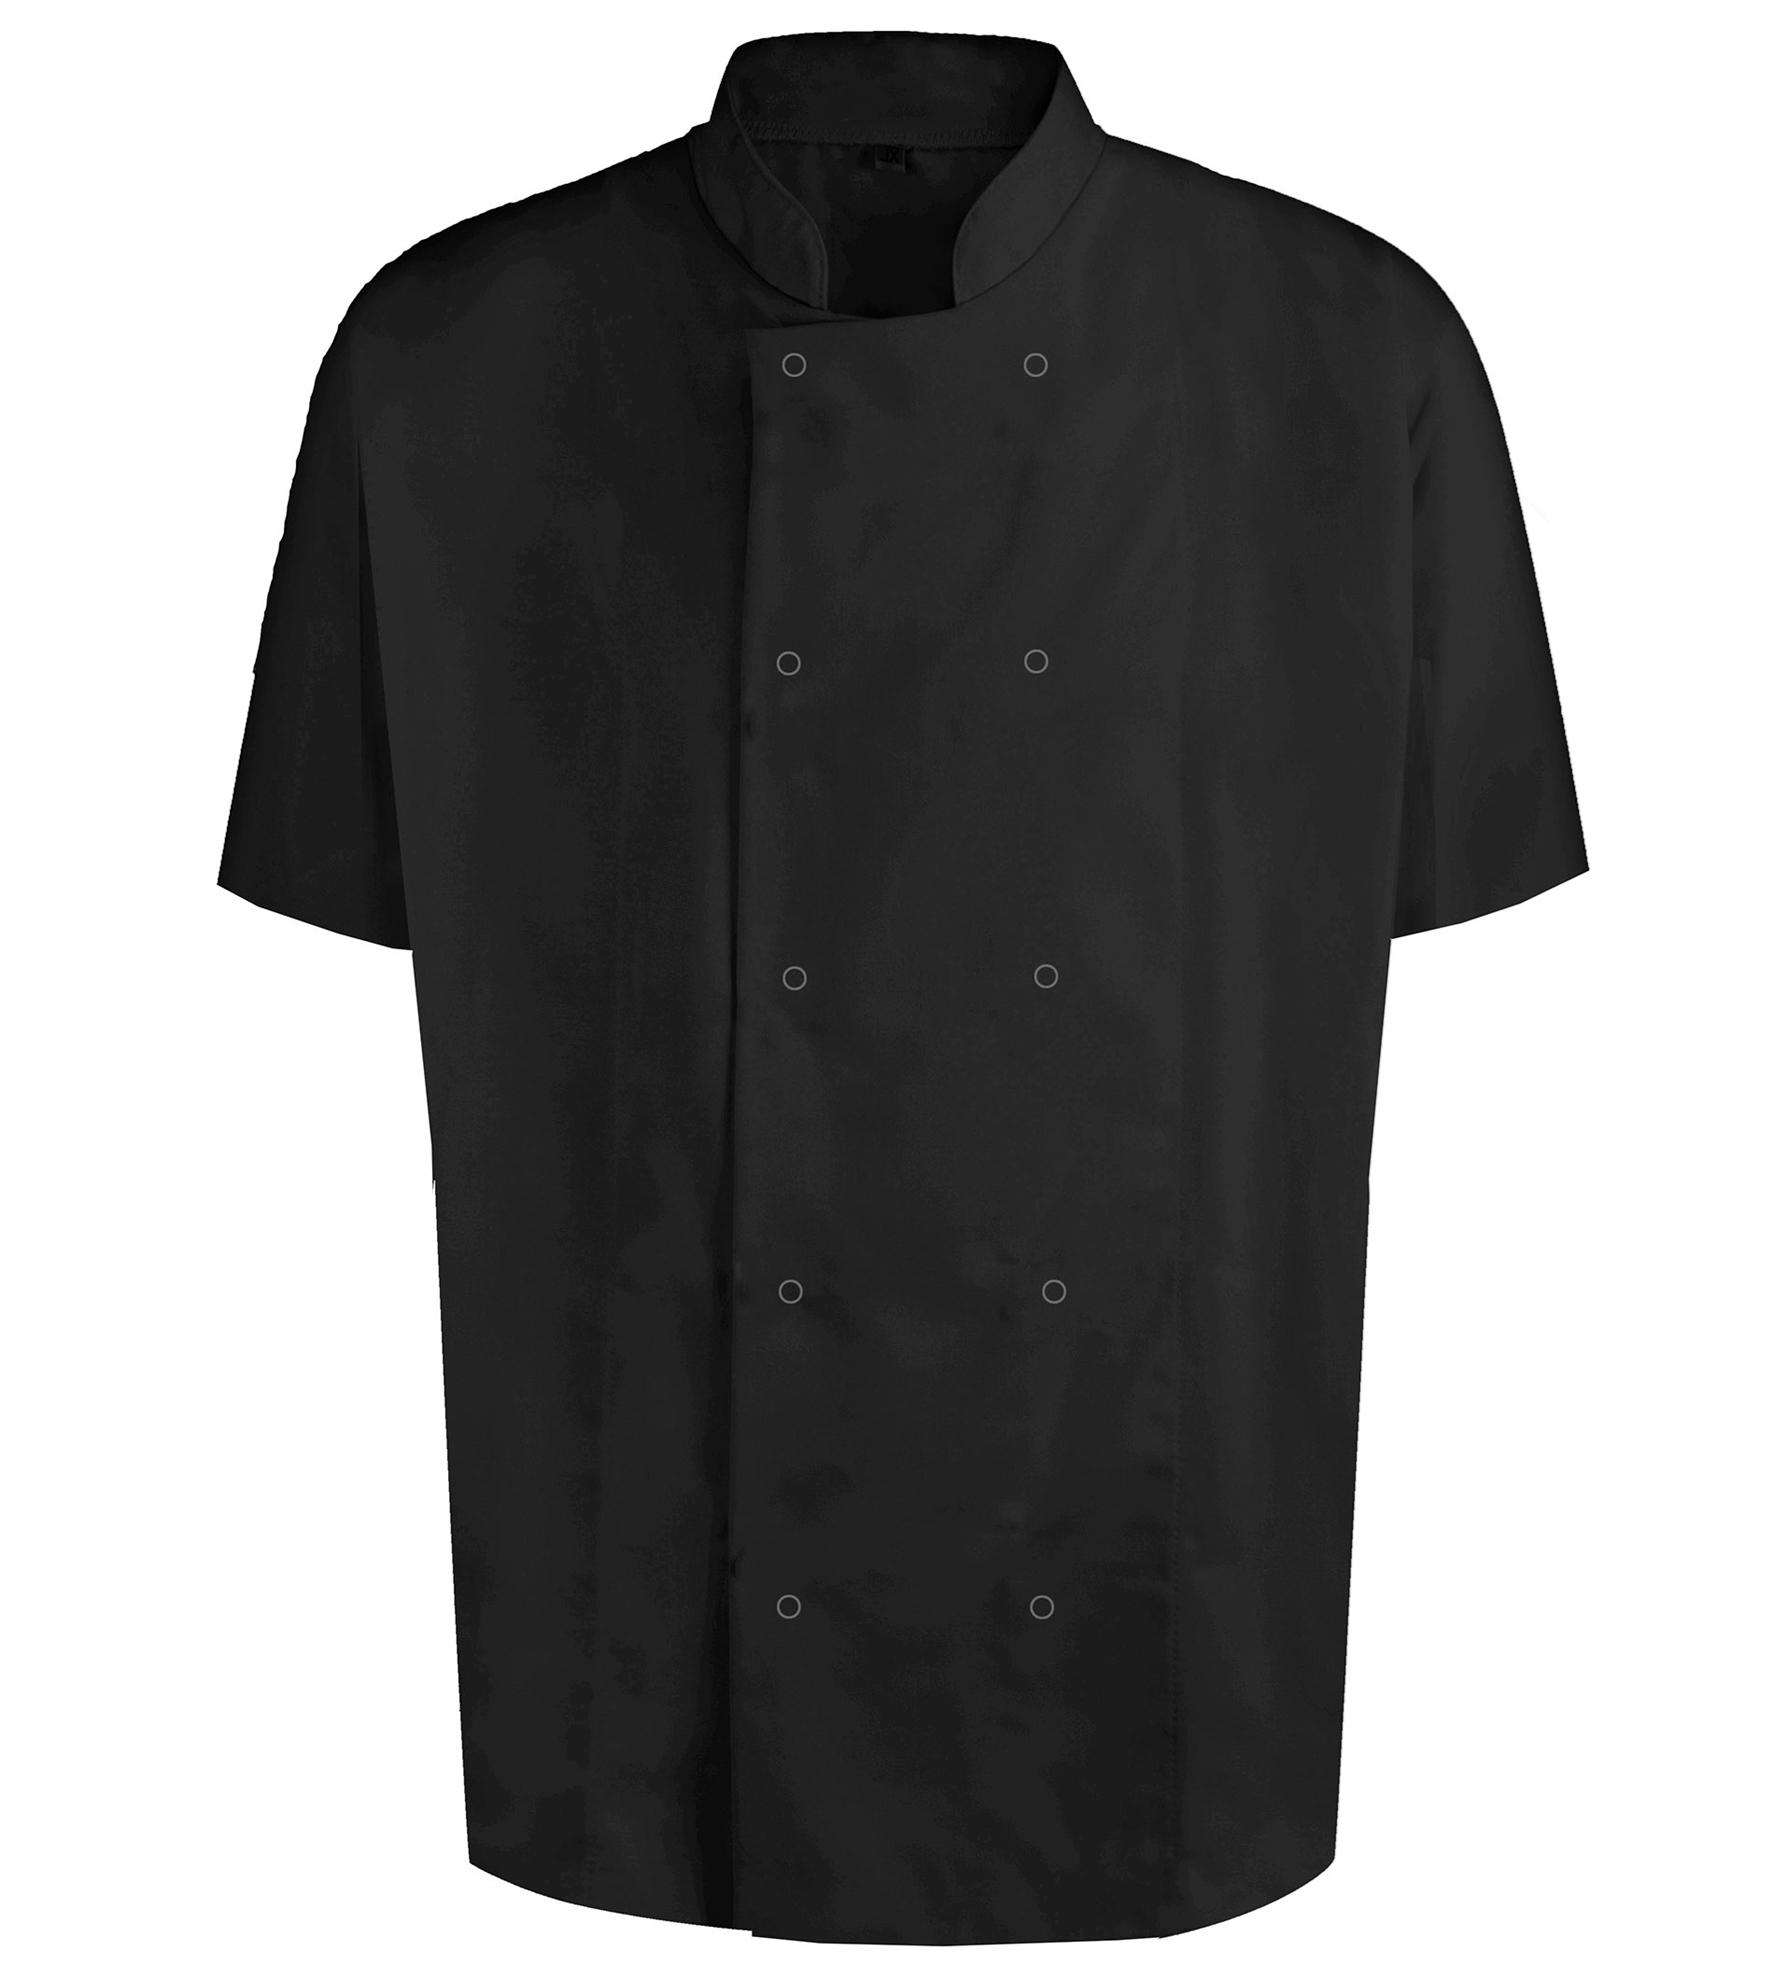 Picture of Unisex Short Sleeve Studded Chefs Jacket - Black